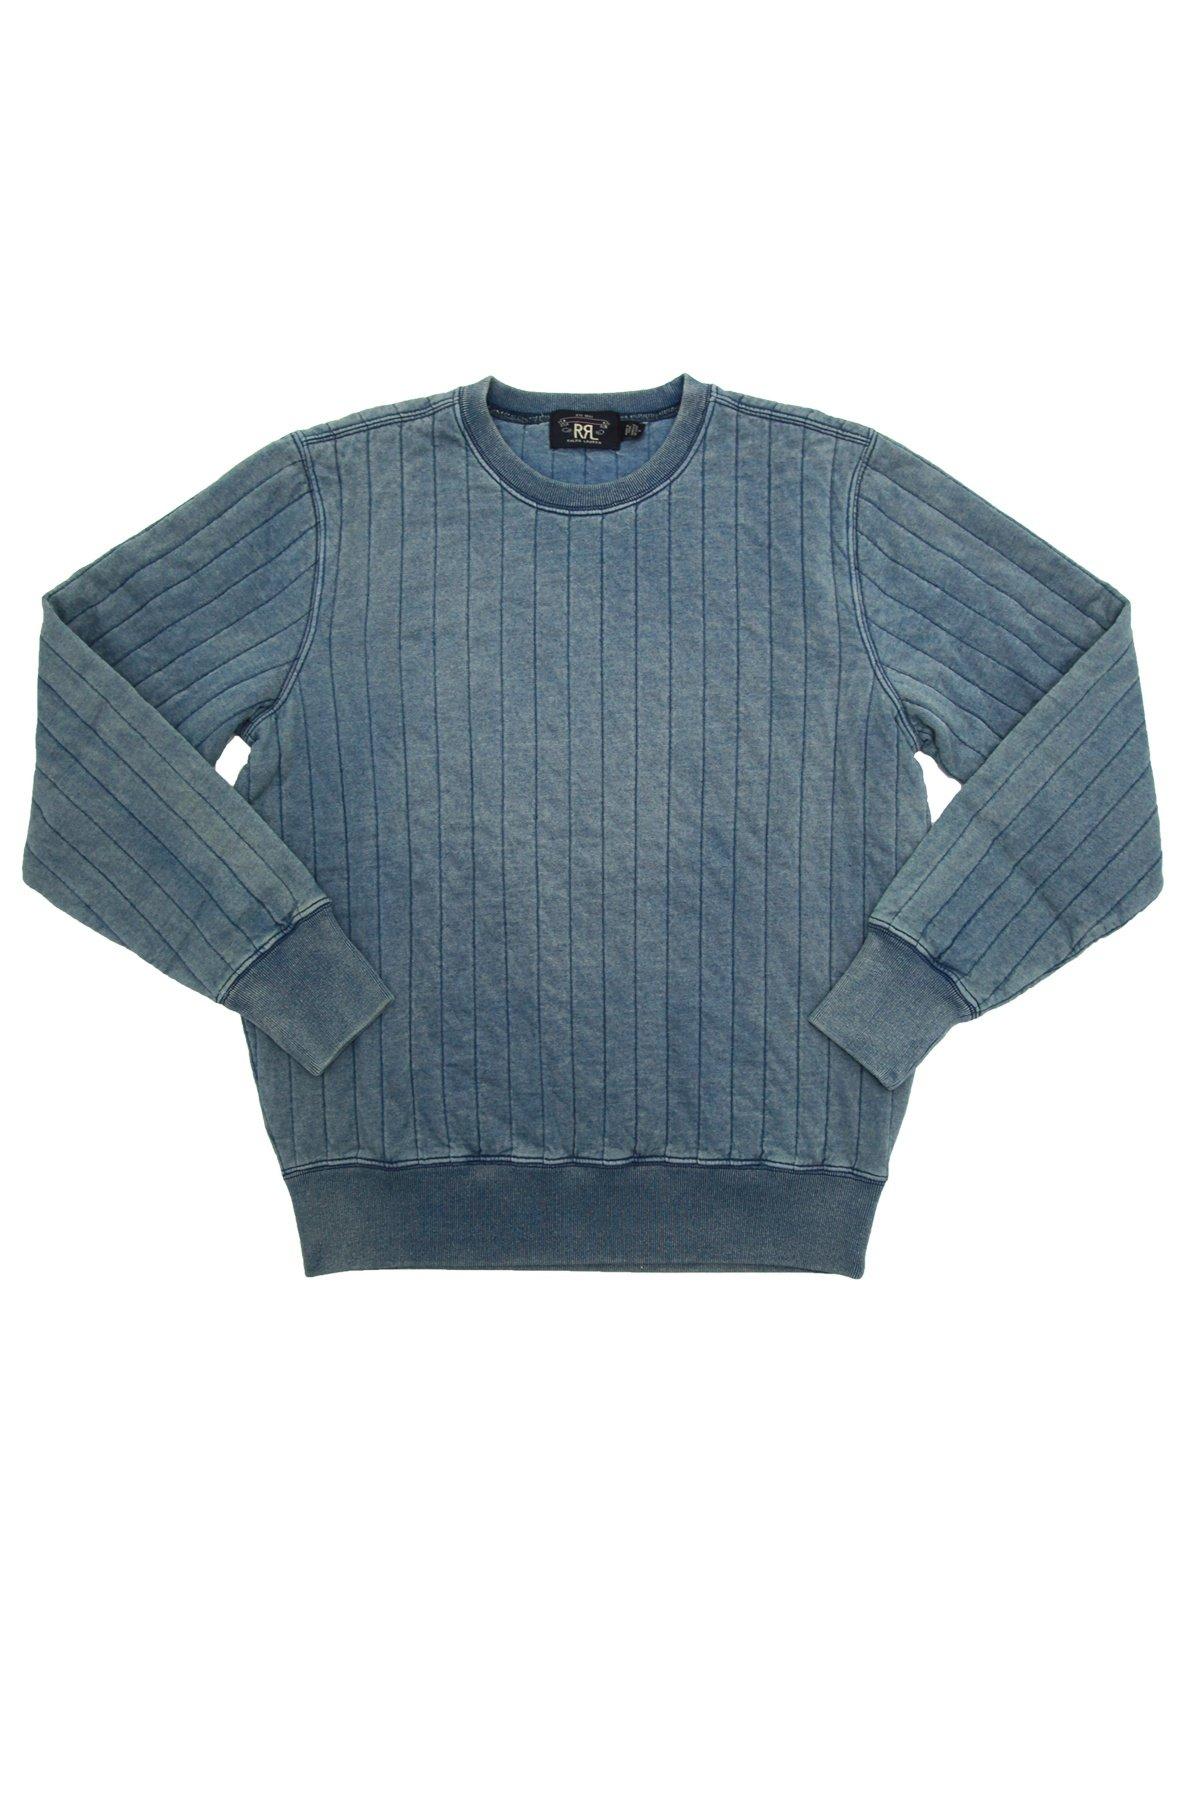 RRL Quilted Crewneck - Washed Blue Indigo